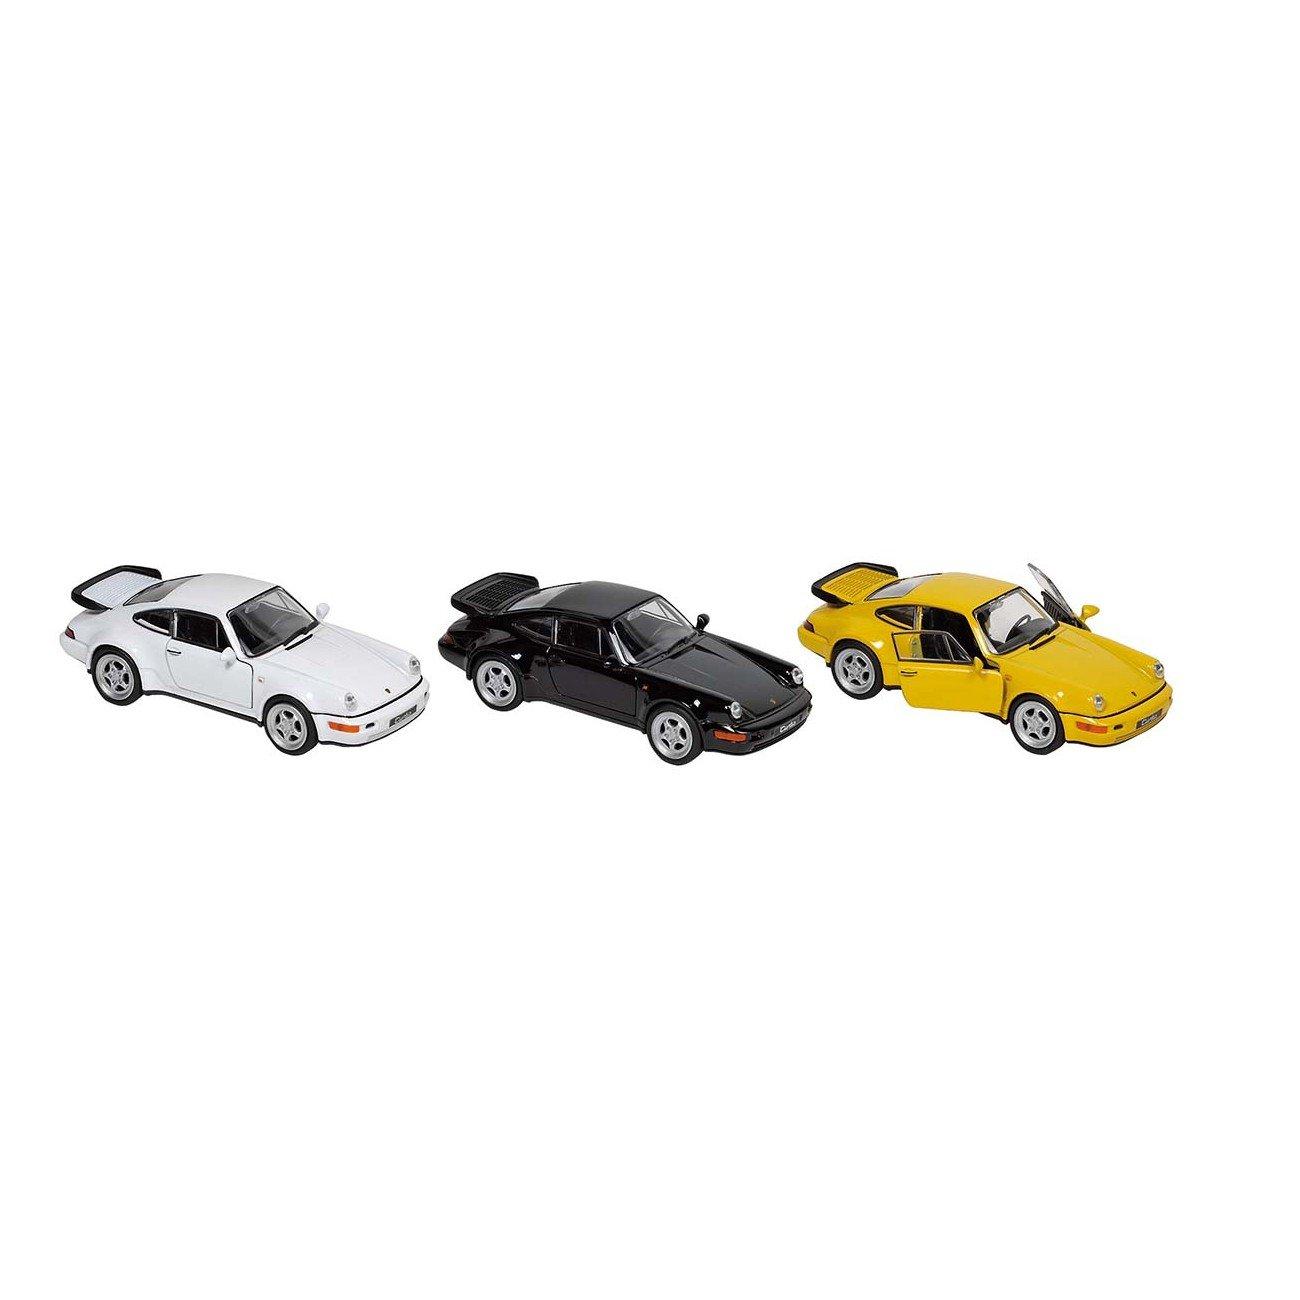 Goki Porsche 964 964 964 Turbo, Spritzguß, 1:37 8c05ba